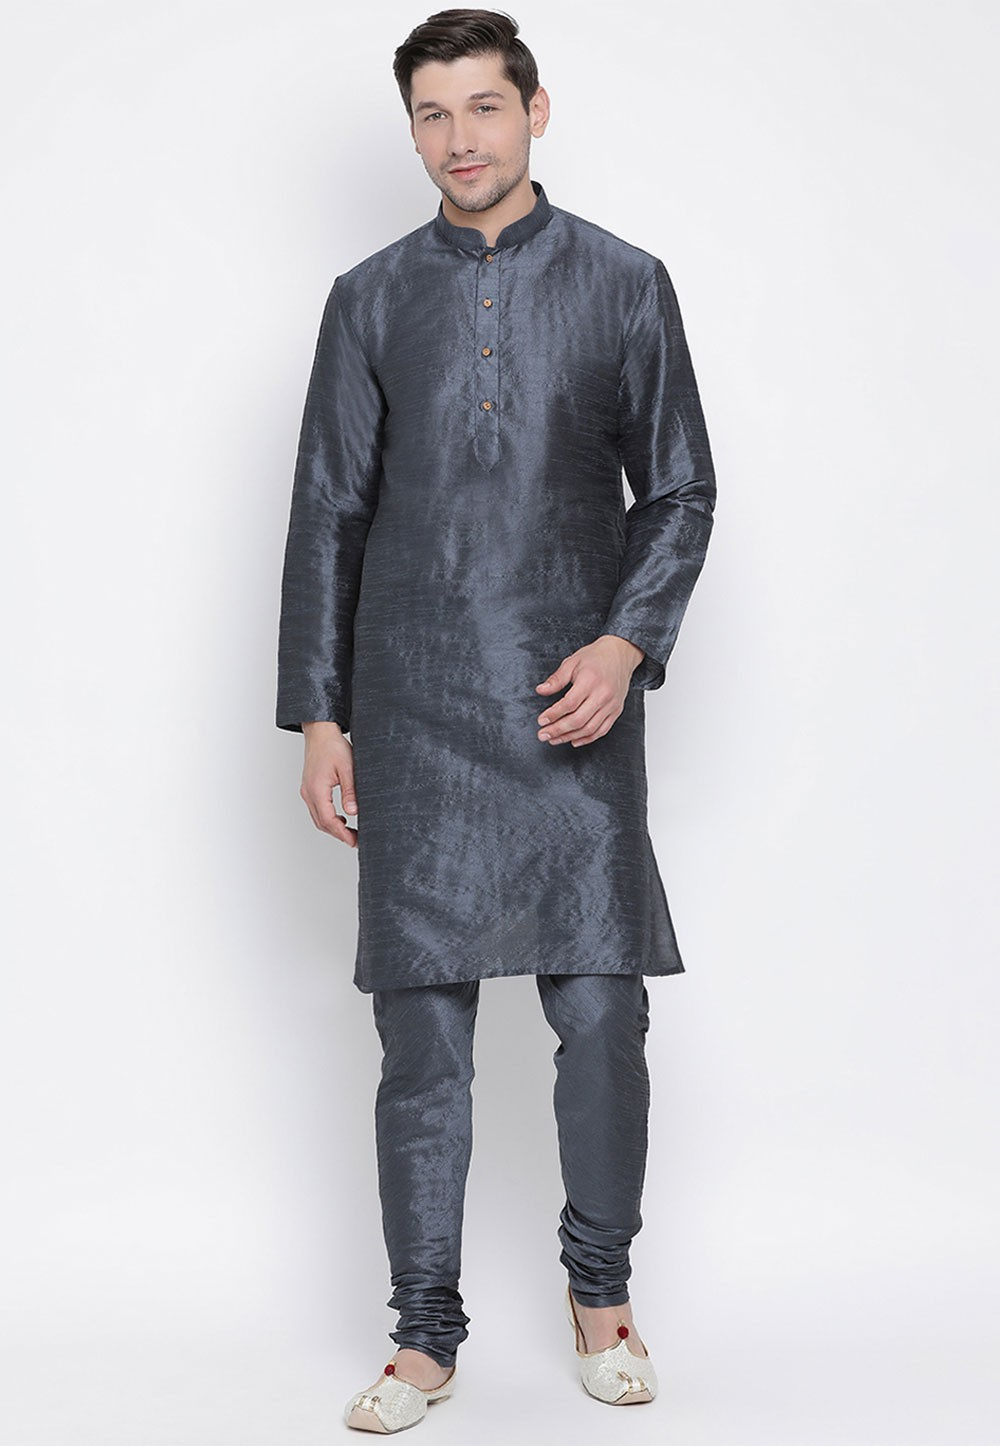 Slate Grey Colour Men's Kurta Pajama.